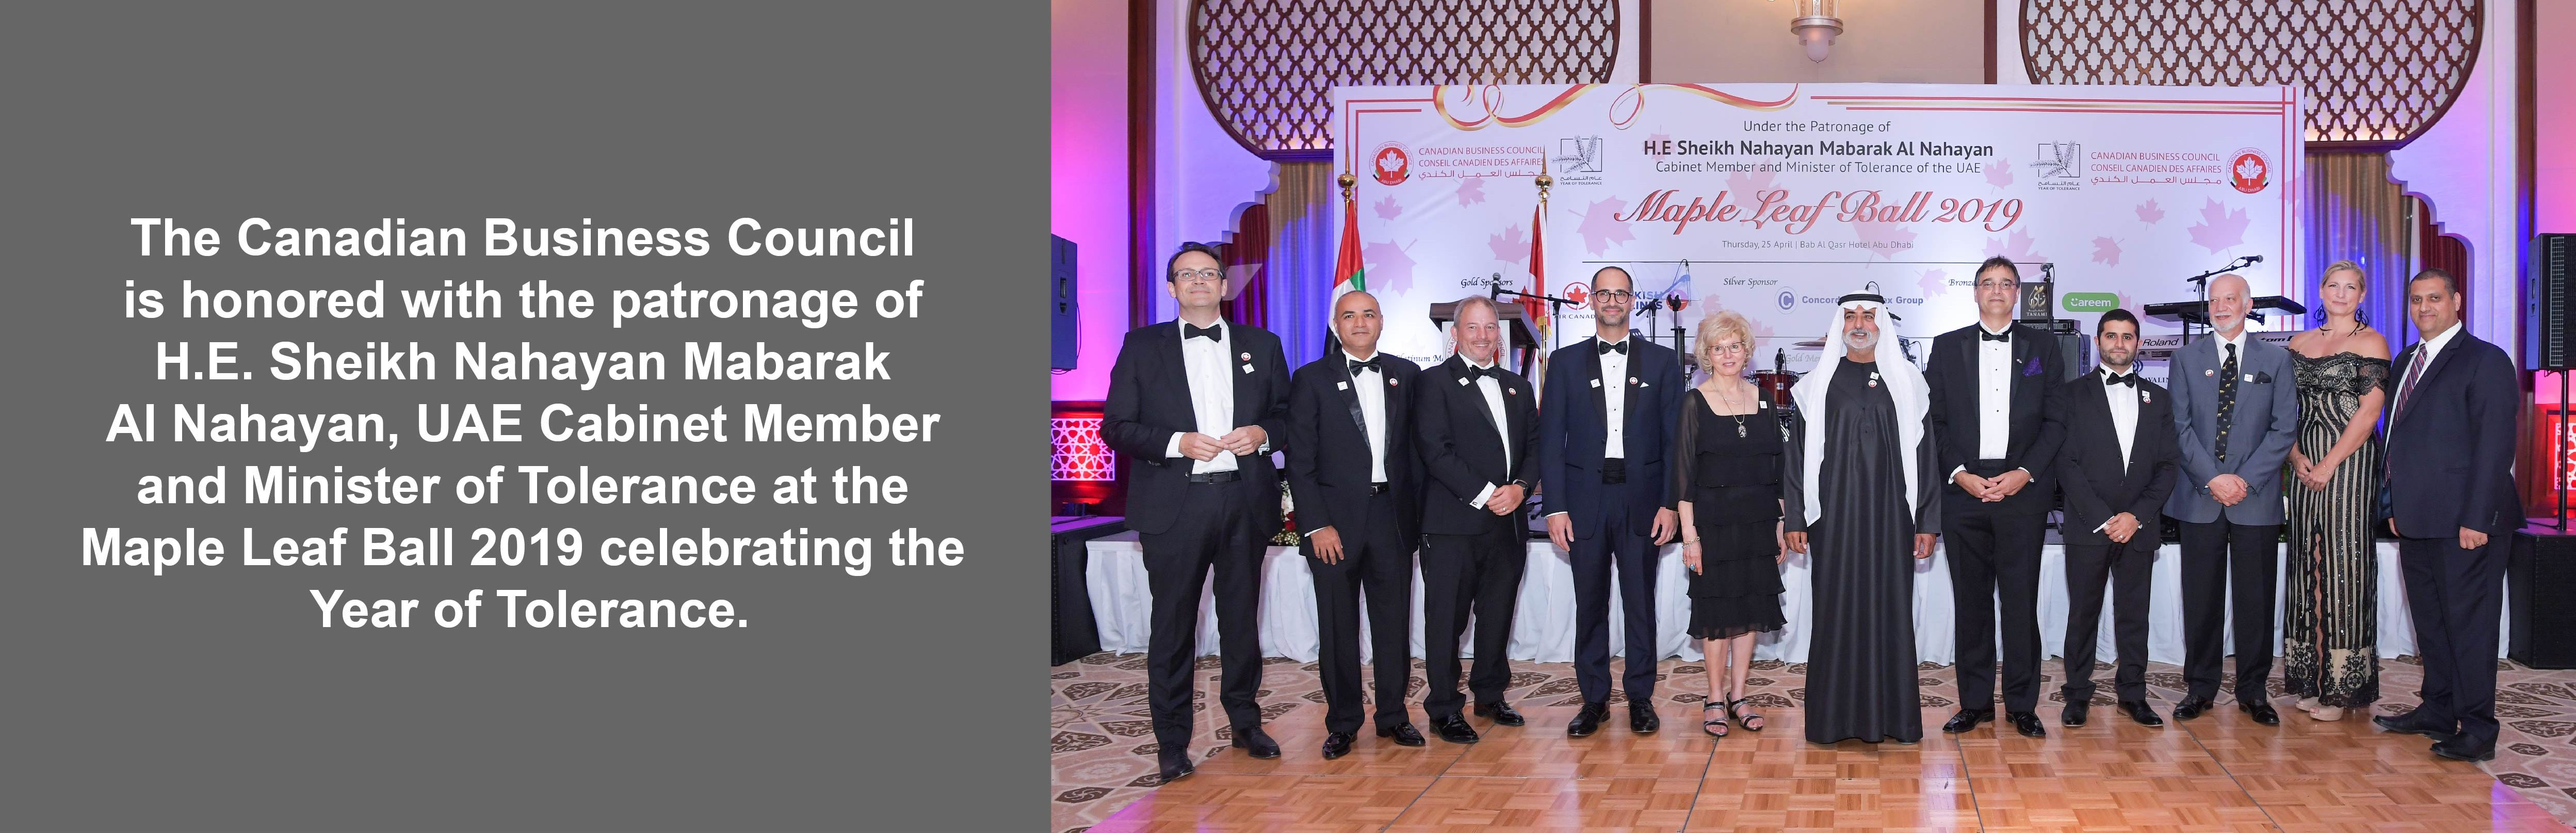 Canadian Business Council Abu Dhabi - Home